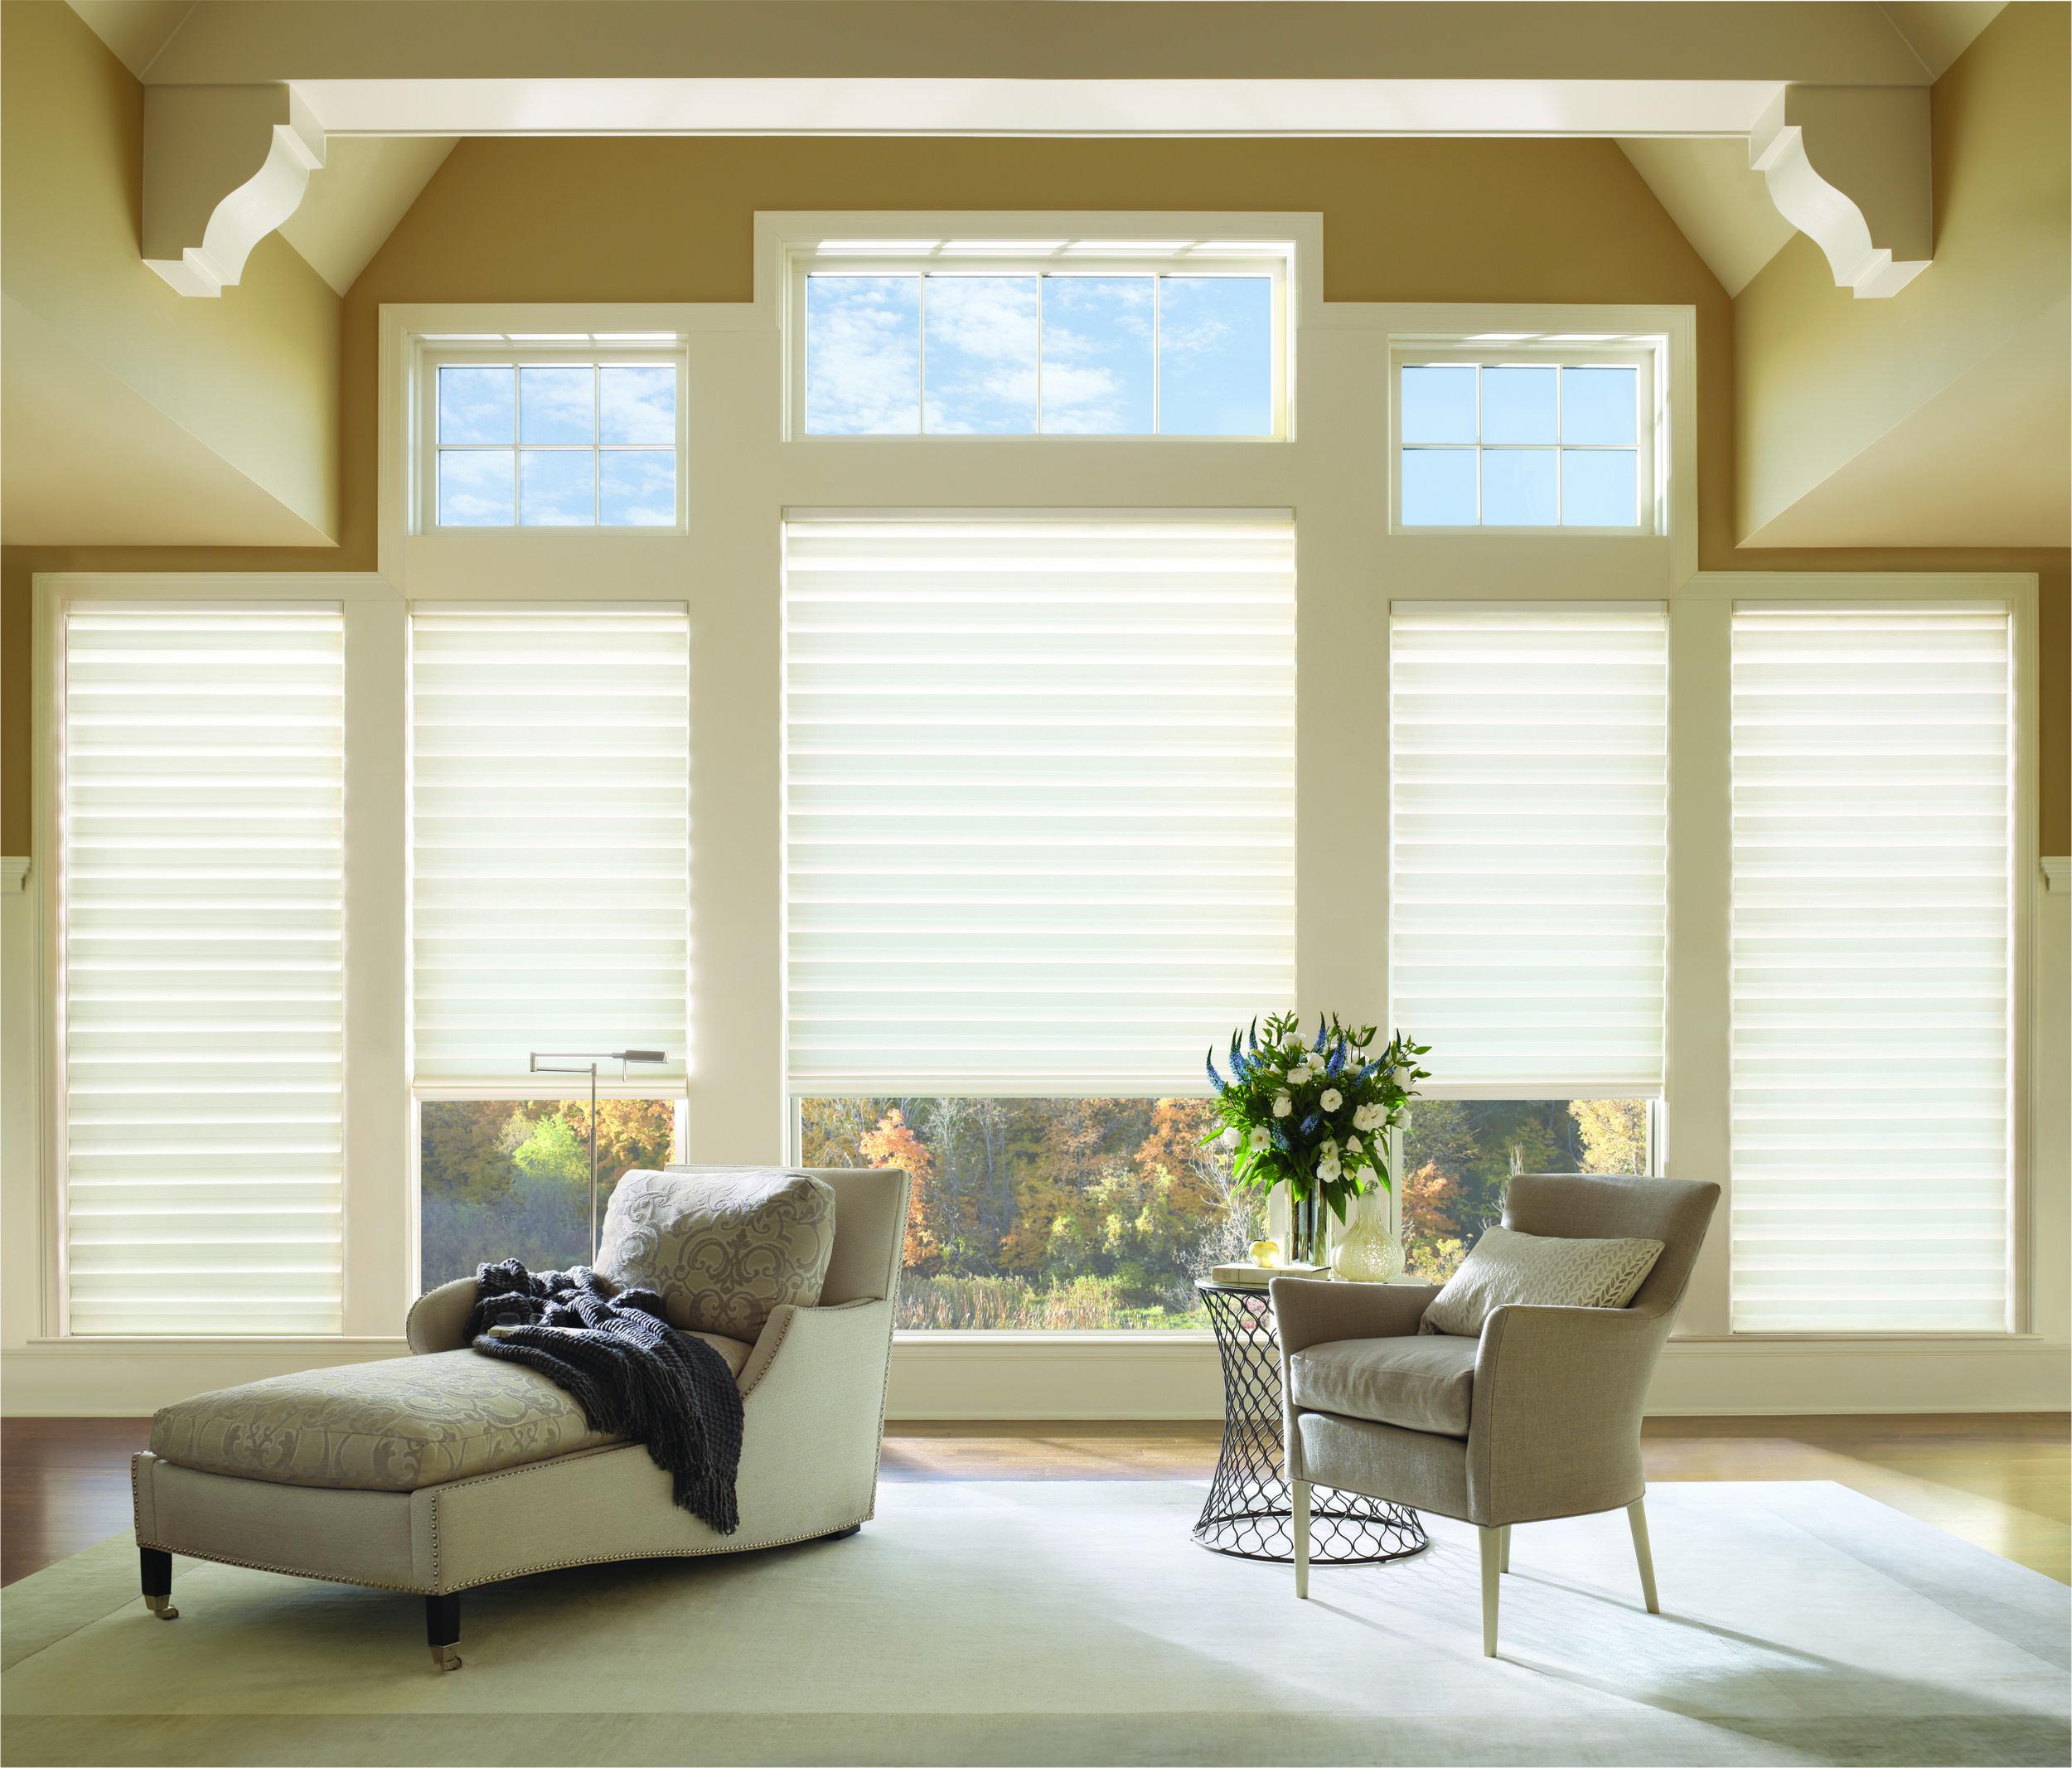 2013_SOLera soft roman shades_ER_Riley_Living Room.jpeg